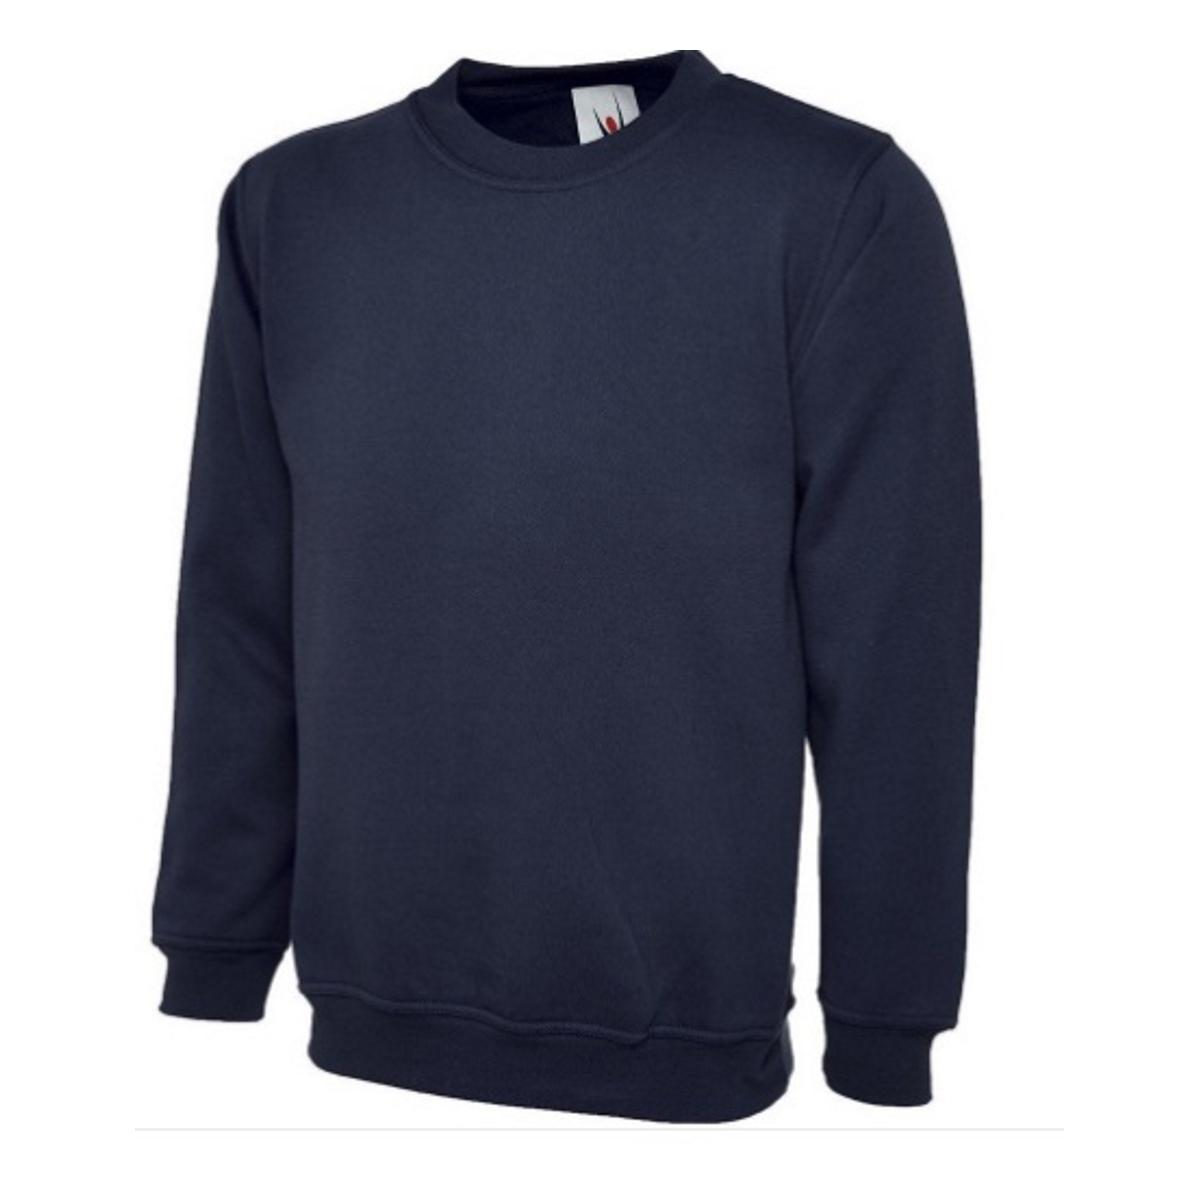 Olympic 260gsm Poly Cotton Sweatshirt